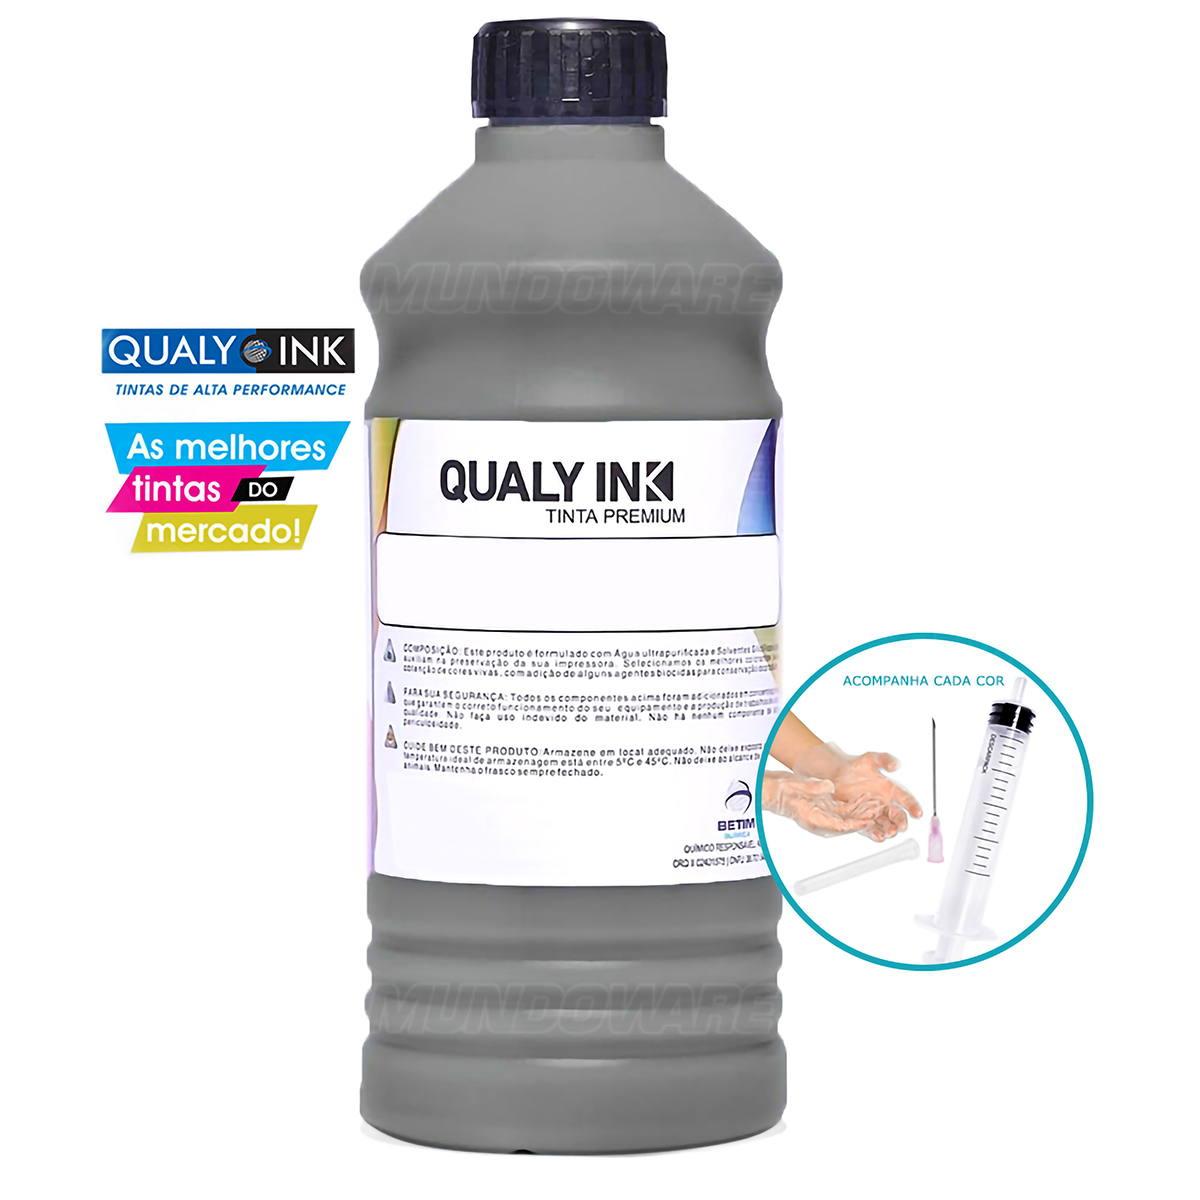 Compatível: Tinta Pigmentada Qualy-Ink BP3E-1532 Série 673 para Epson L800 L805 L810 L850 L1800 Preto 1L